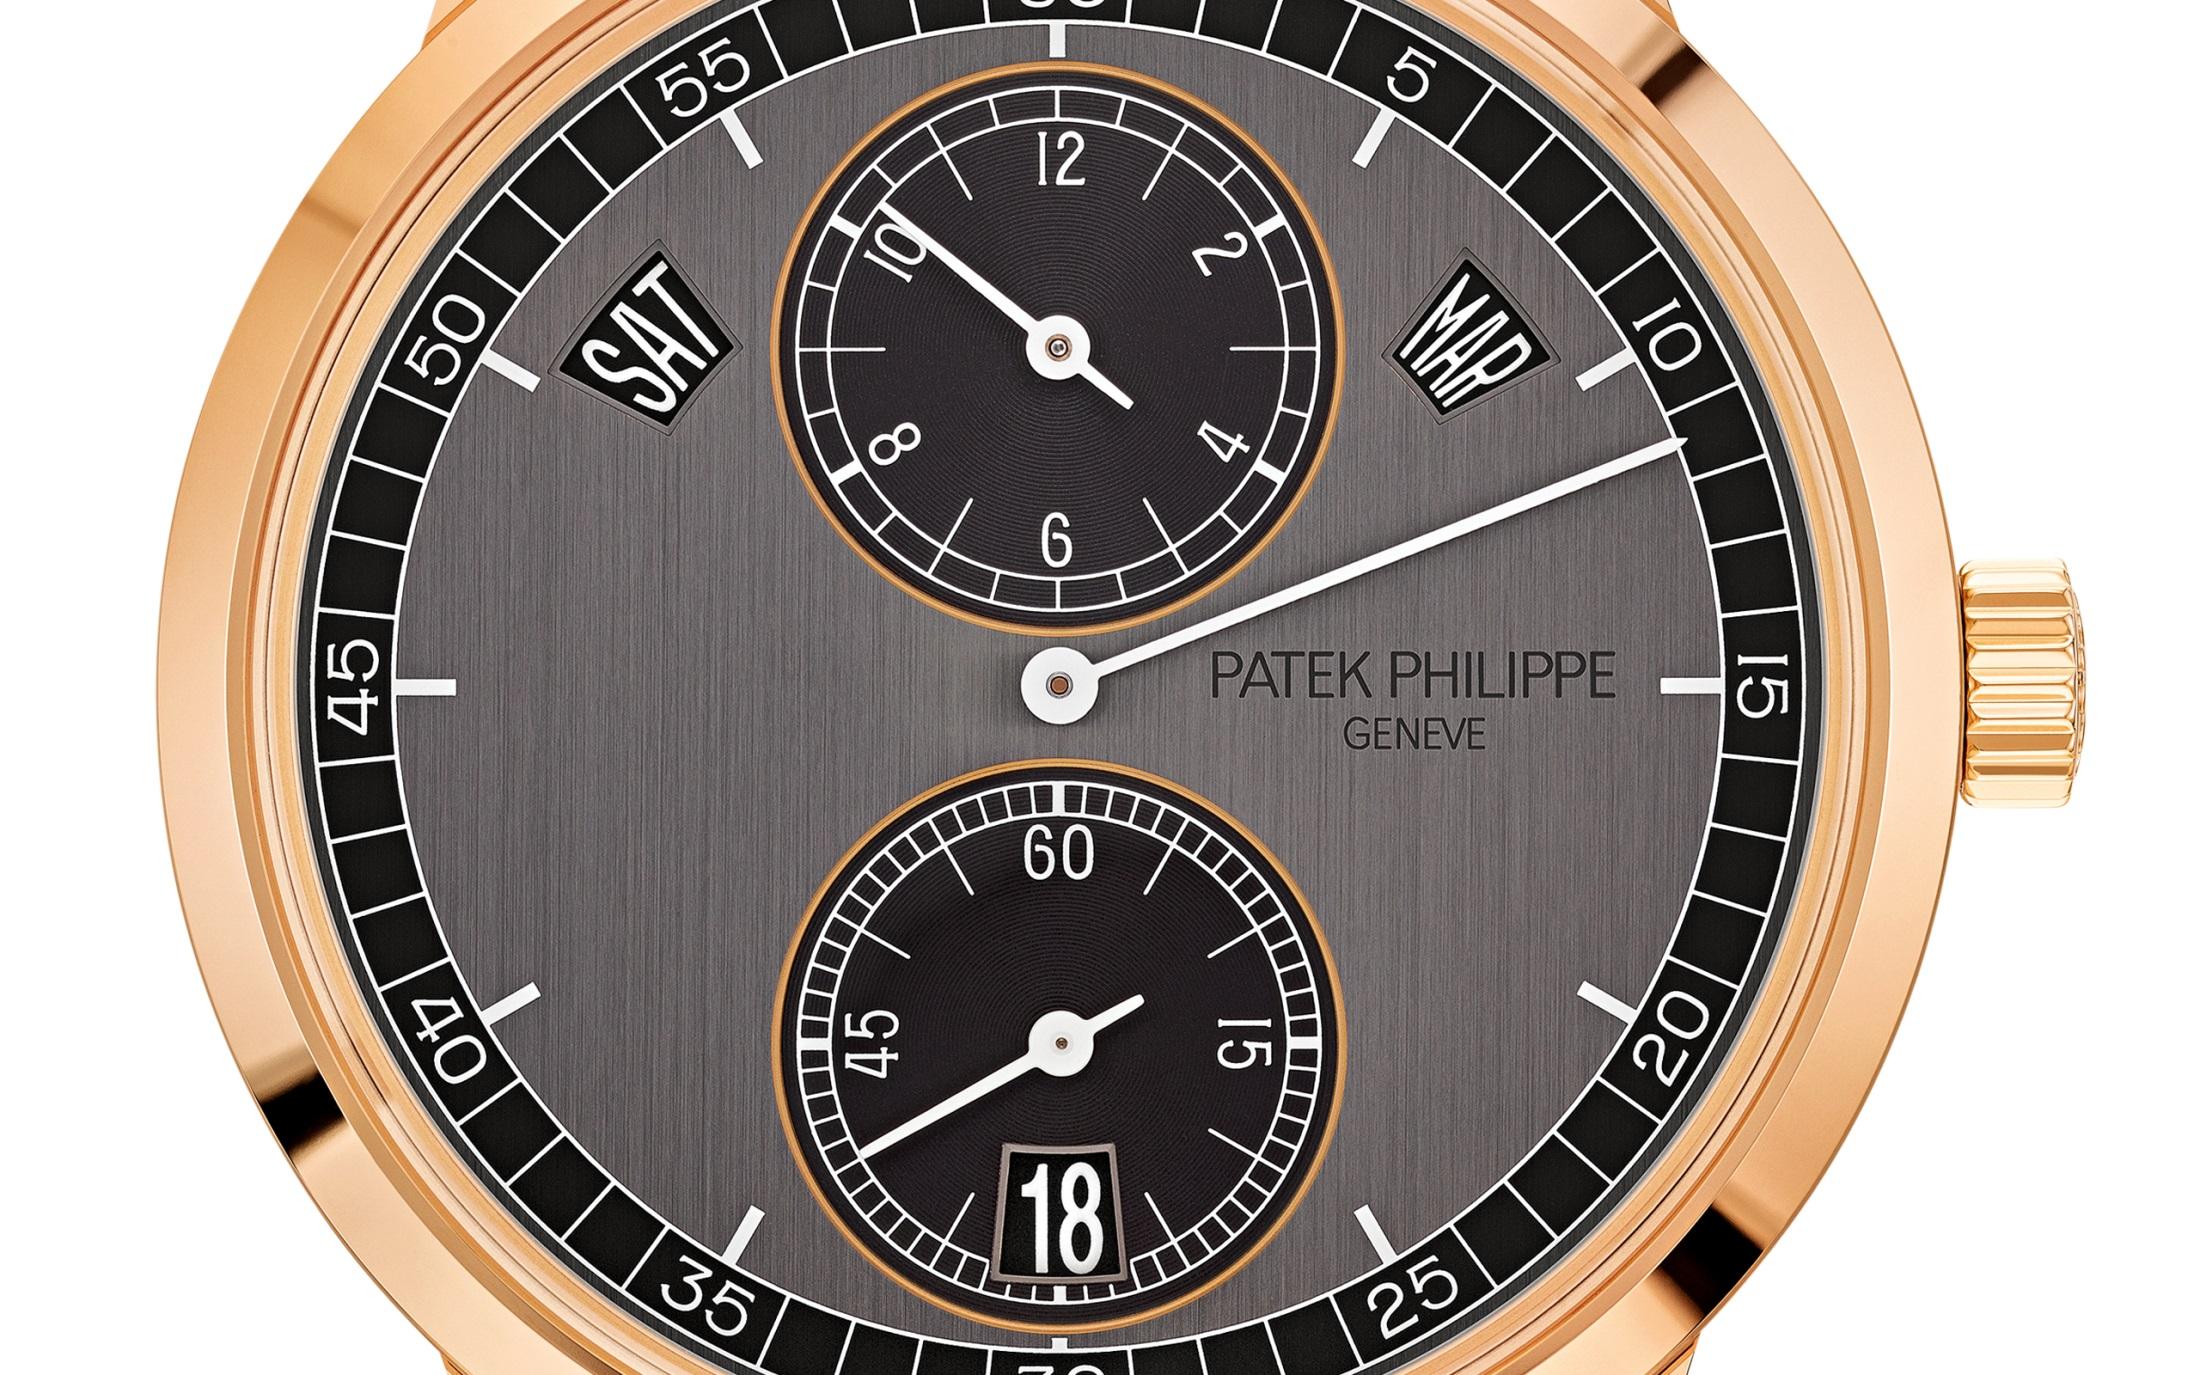 Patek Philippe Annual Calendar Regulator 5235R - Baselworld 2019 - 7